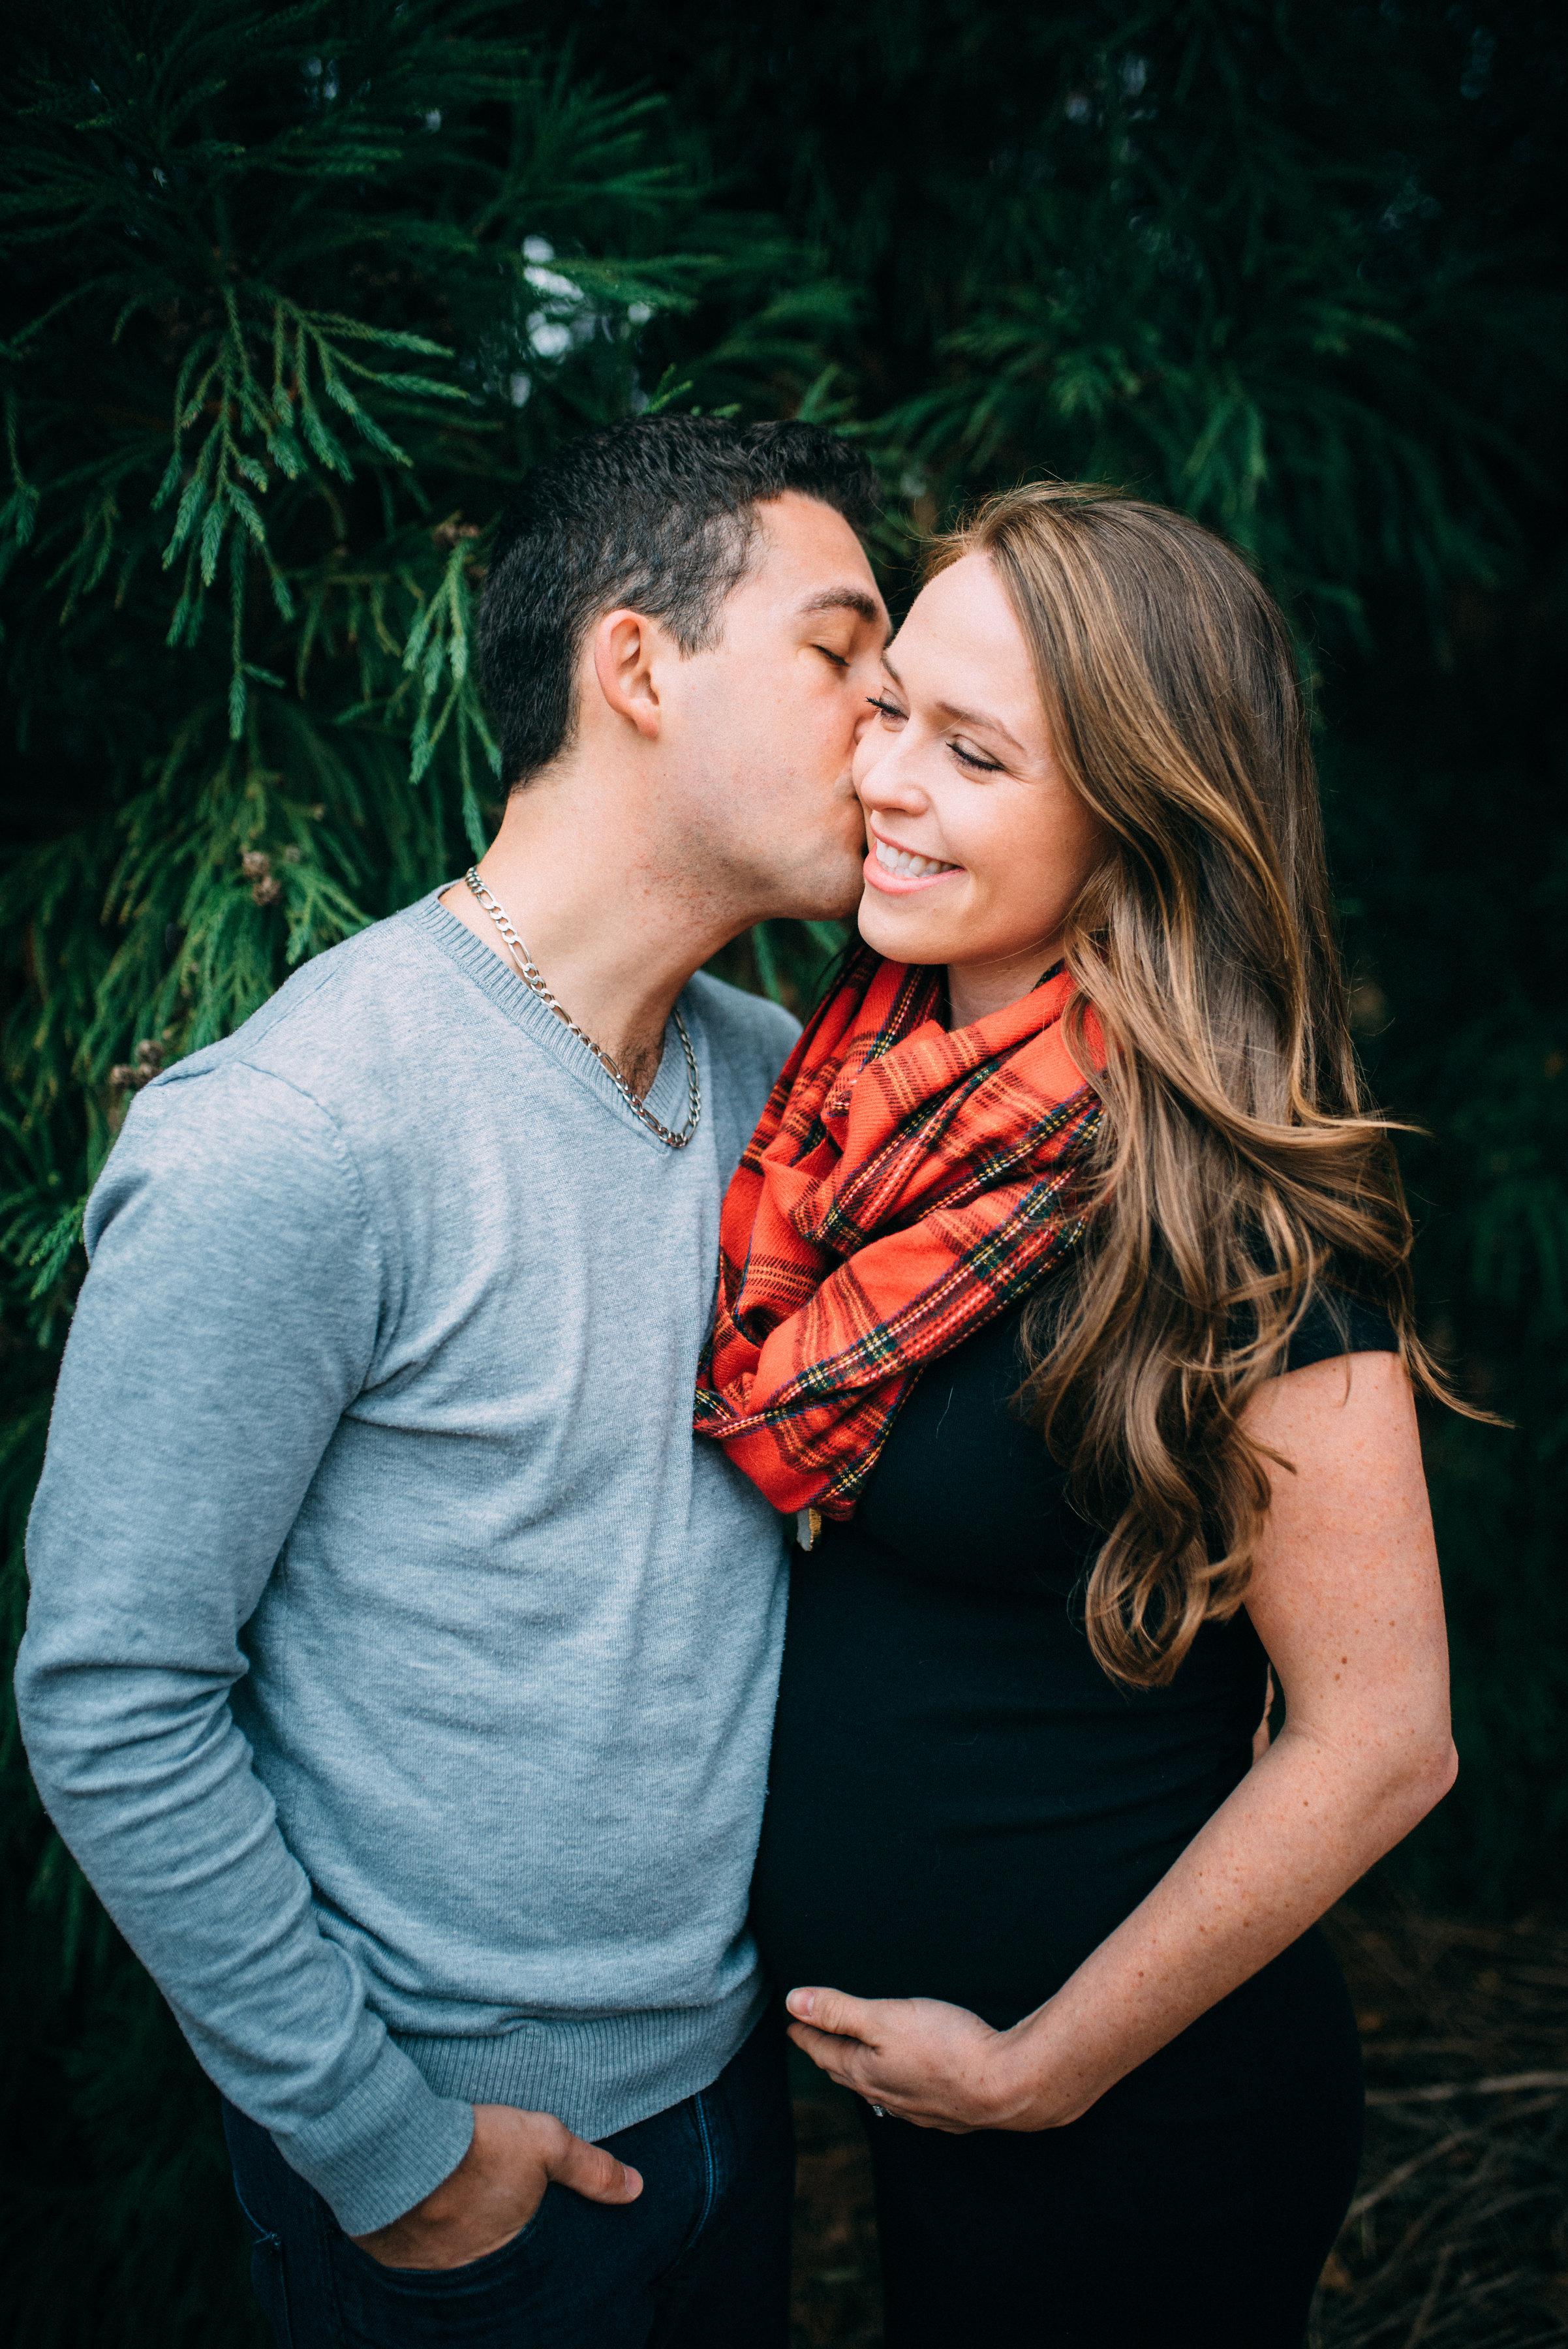 raleigh maternity photographer - north carolina wedding photographer - raleigh wedding photographer